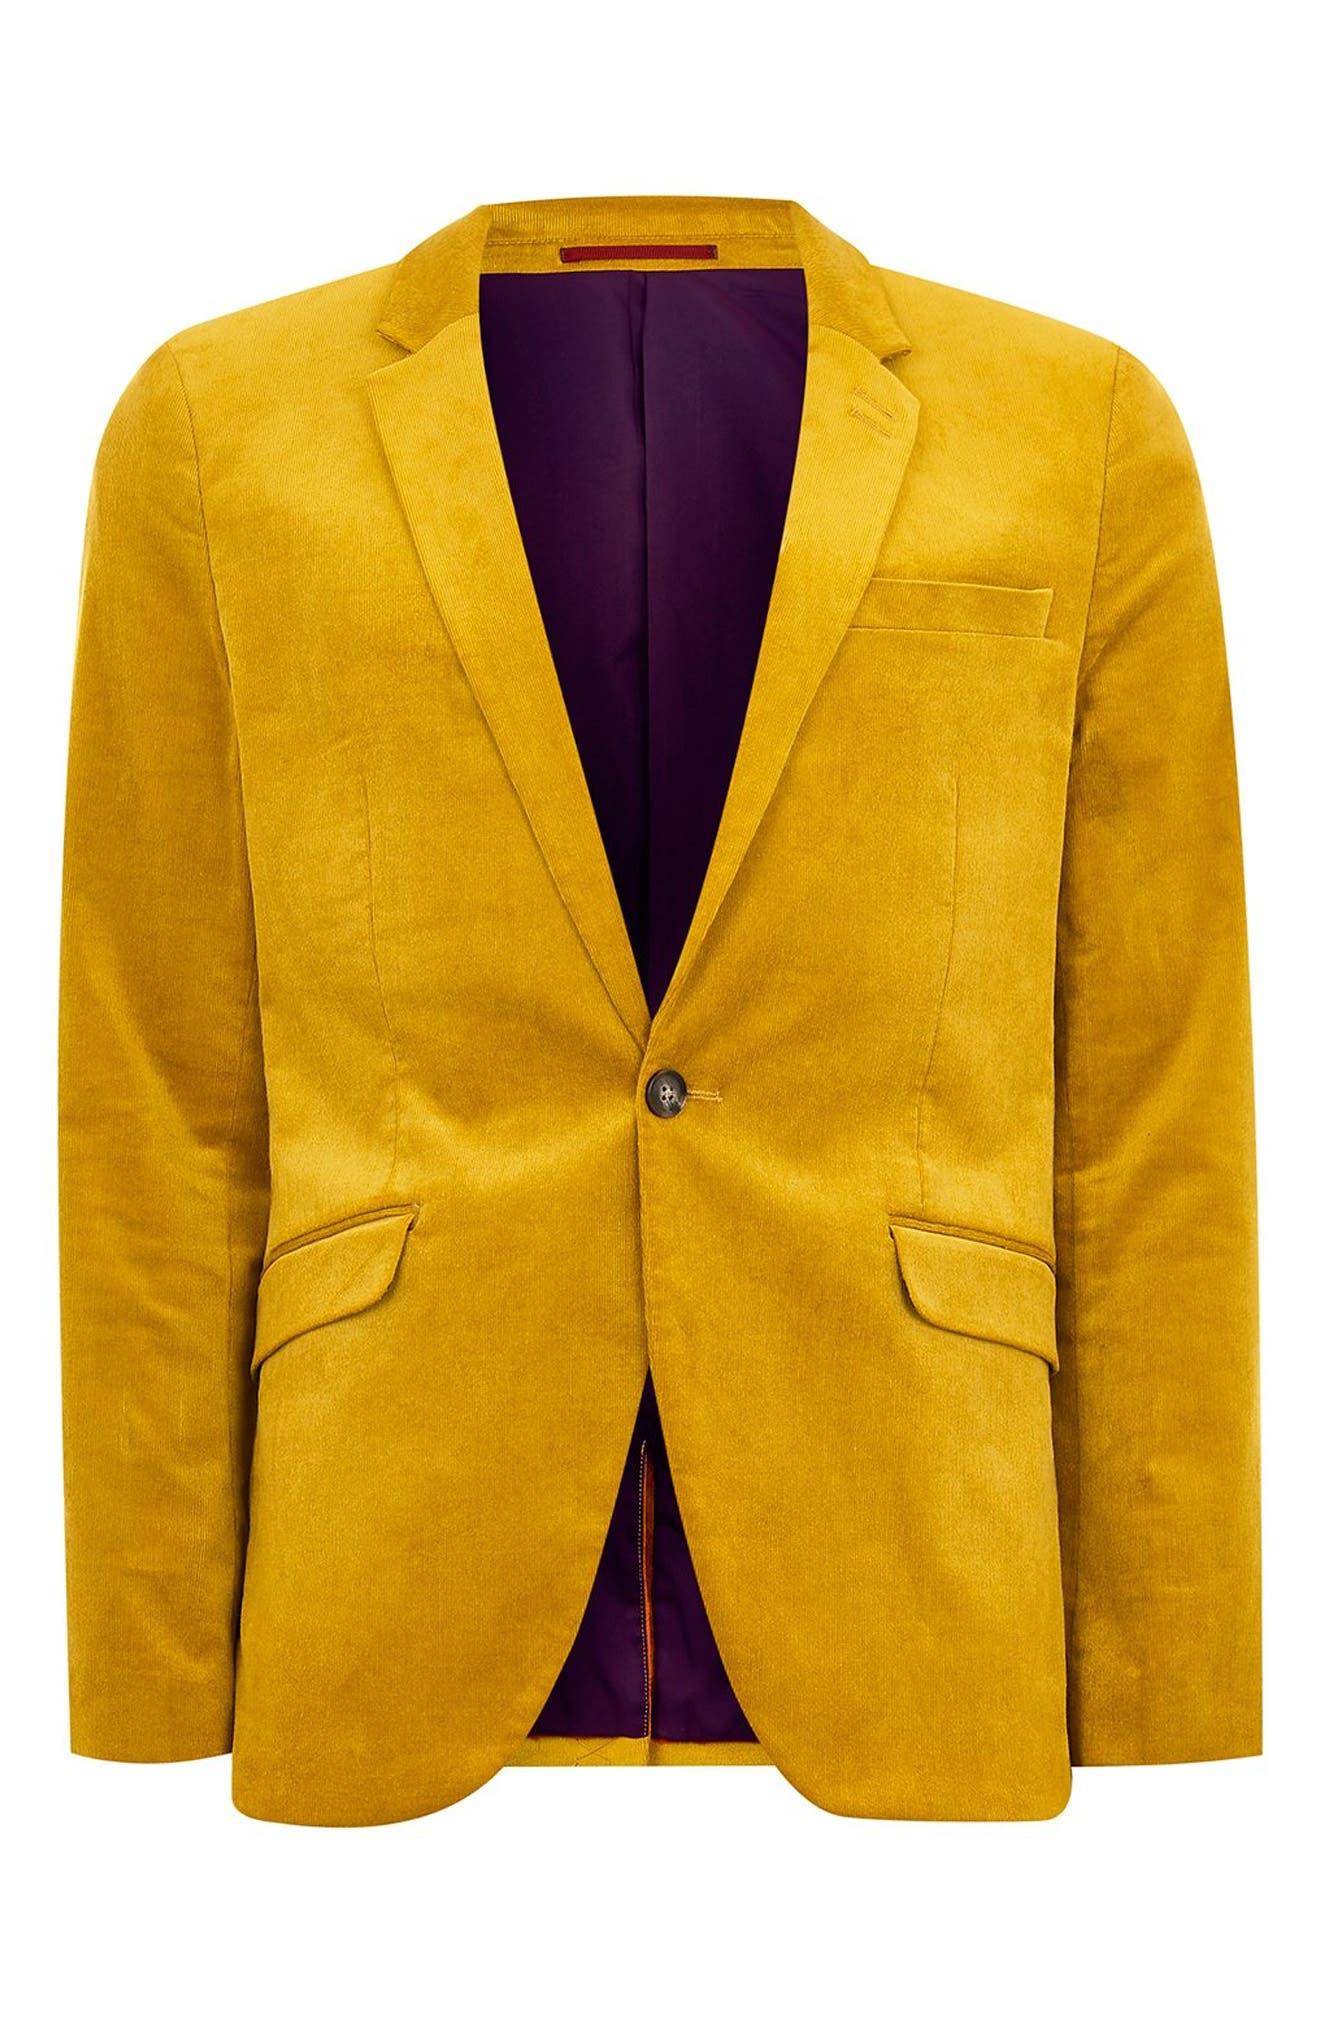 TOPMAN,                             Corduroy Super Skinny Suit Jacket,                             Alternate thumbnail 4, color,                             700